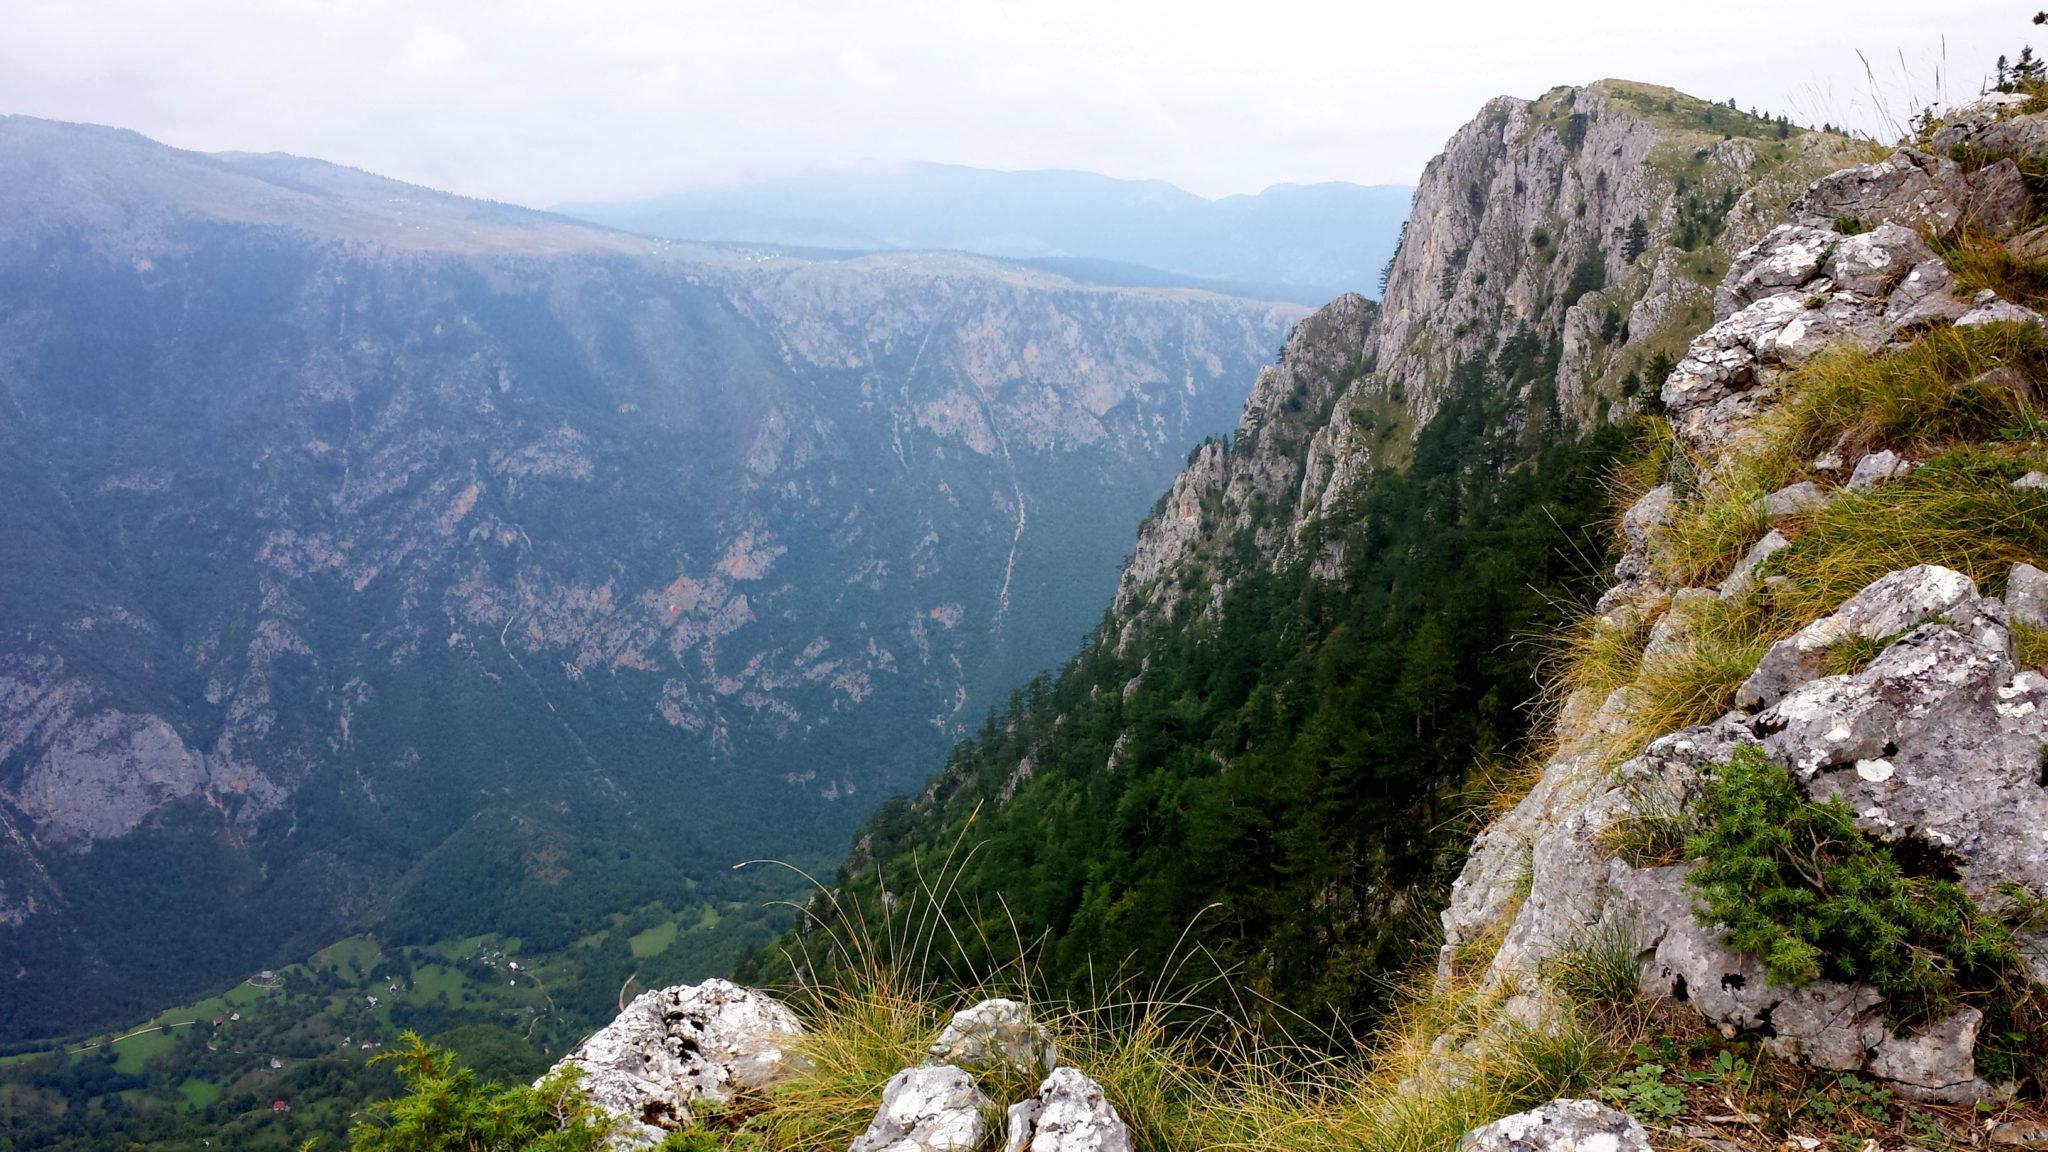 Hemaposesesvalises_montenegro_la_randonnee_champignon_voyage_travel_blog1